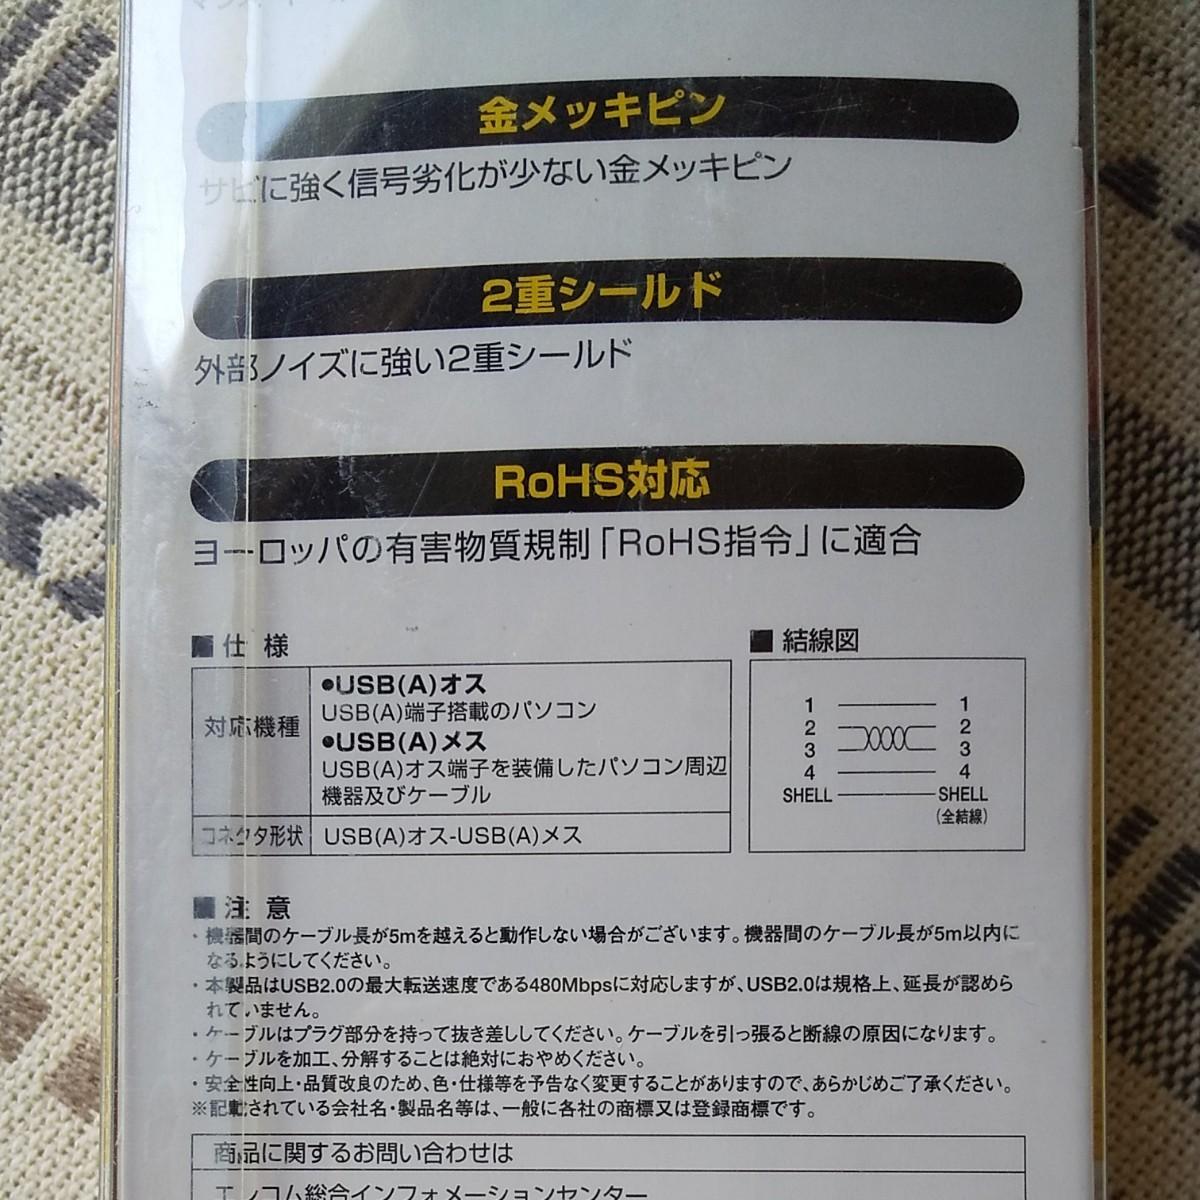 ELECOM USB2.0準拠 延長ケーブル Aタイプ/2.0m (ブラック) (U2C-E20BK)